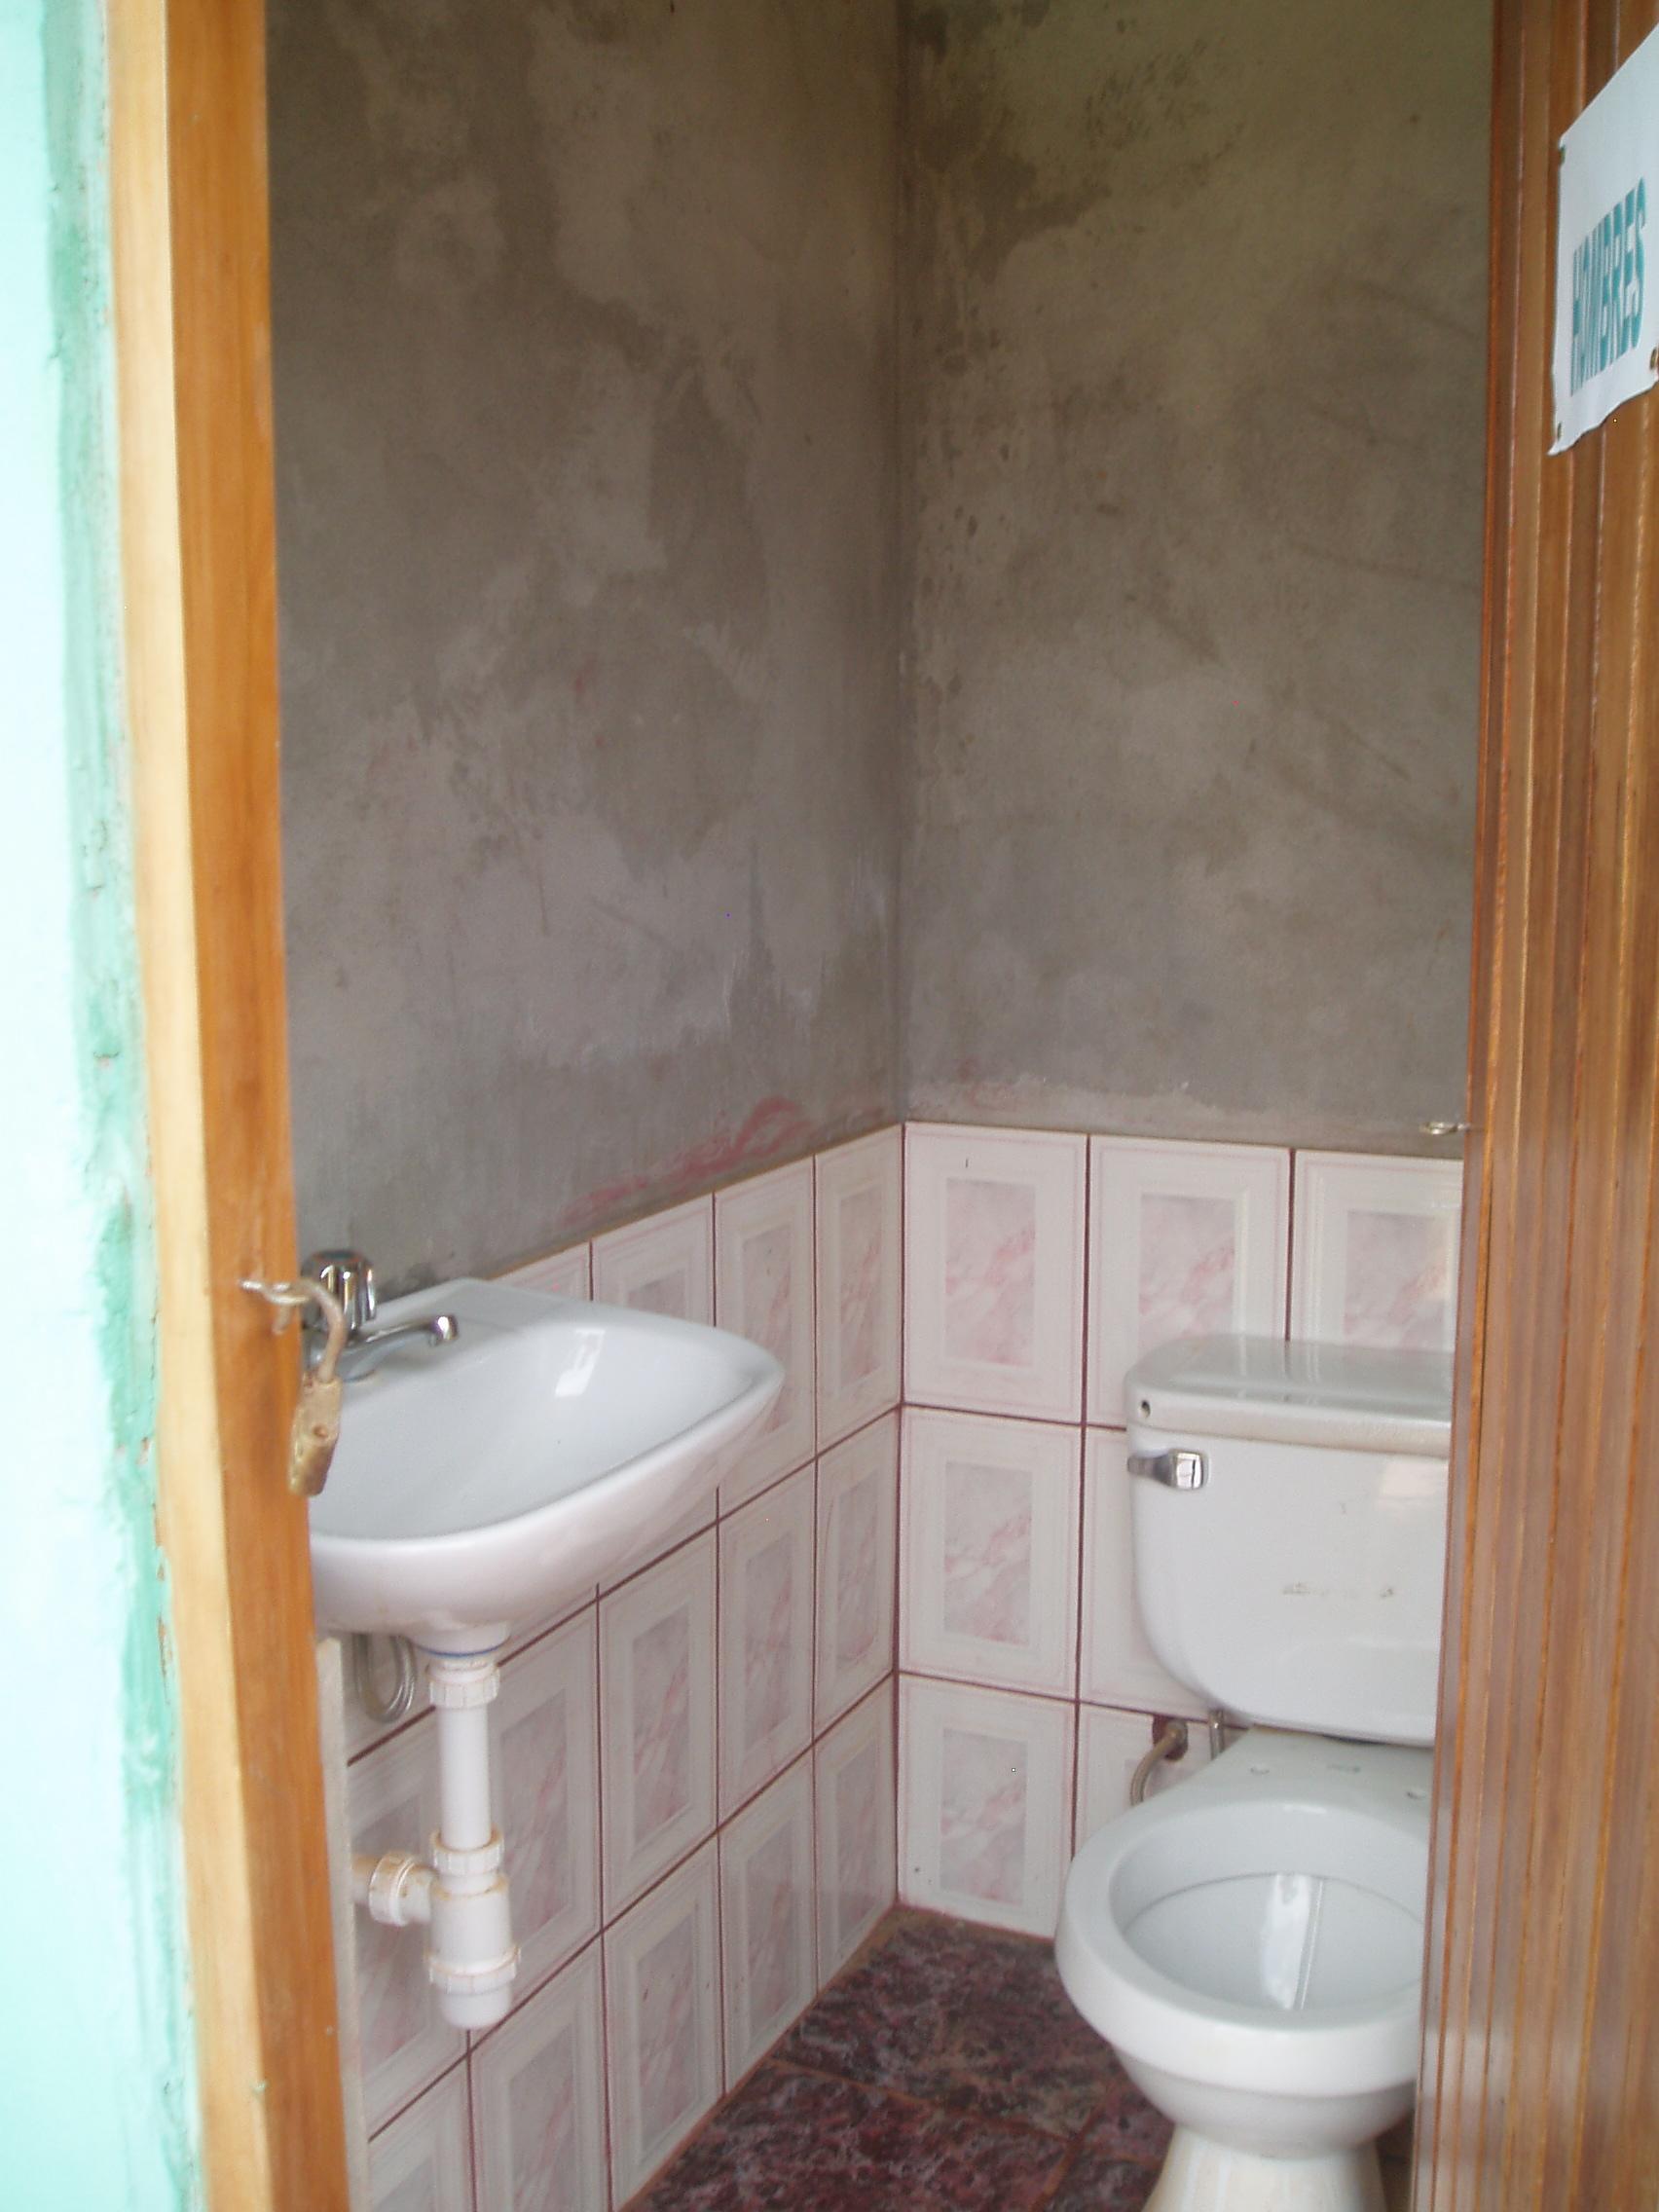 Bello Toilet.JPG